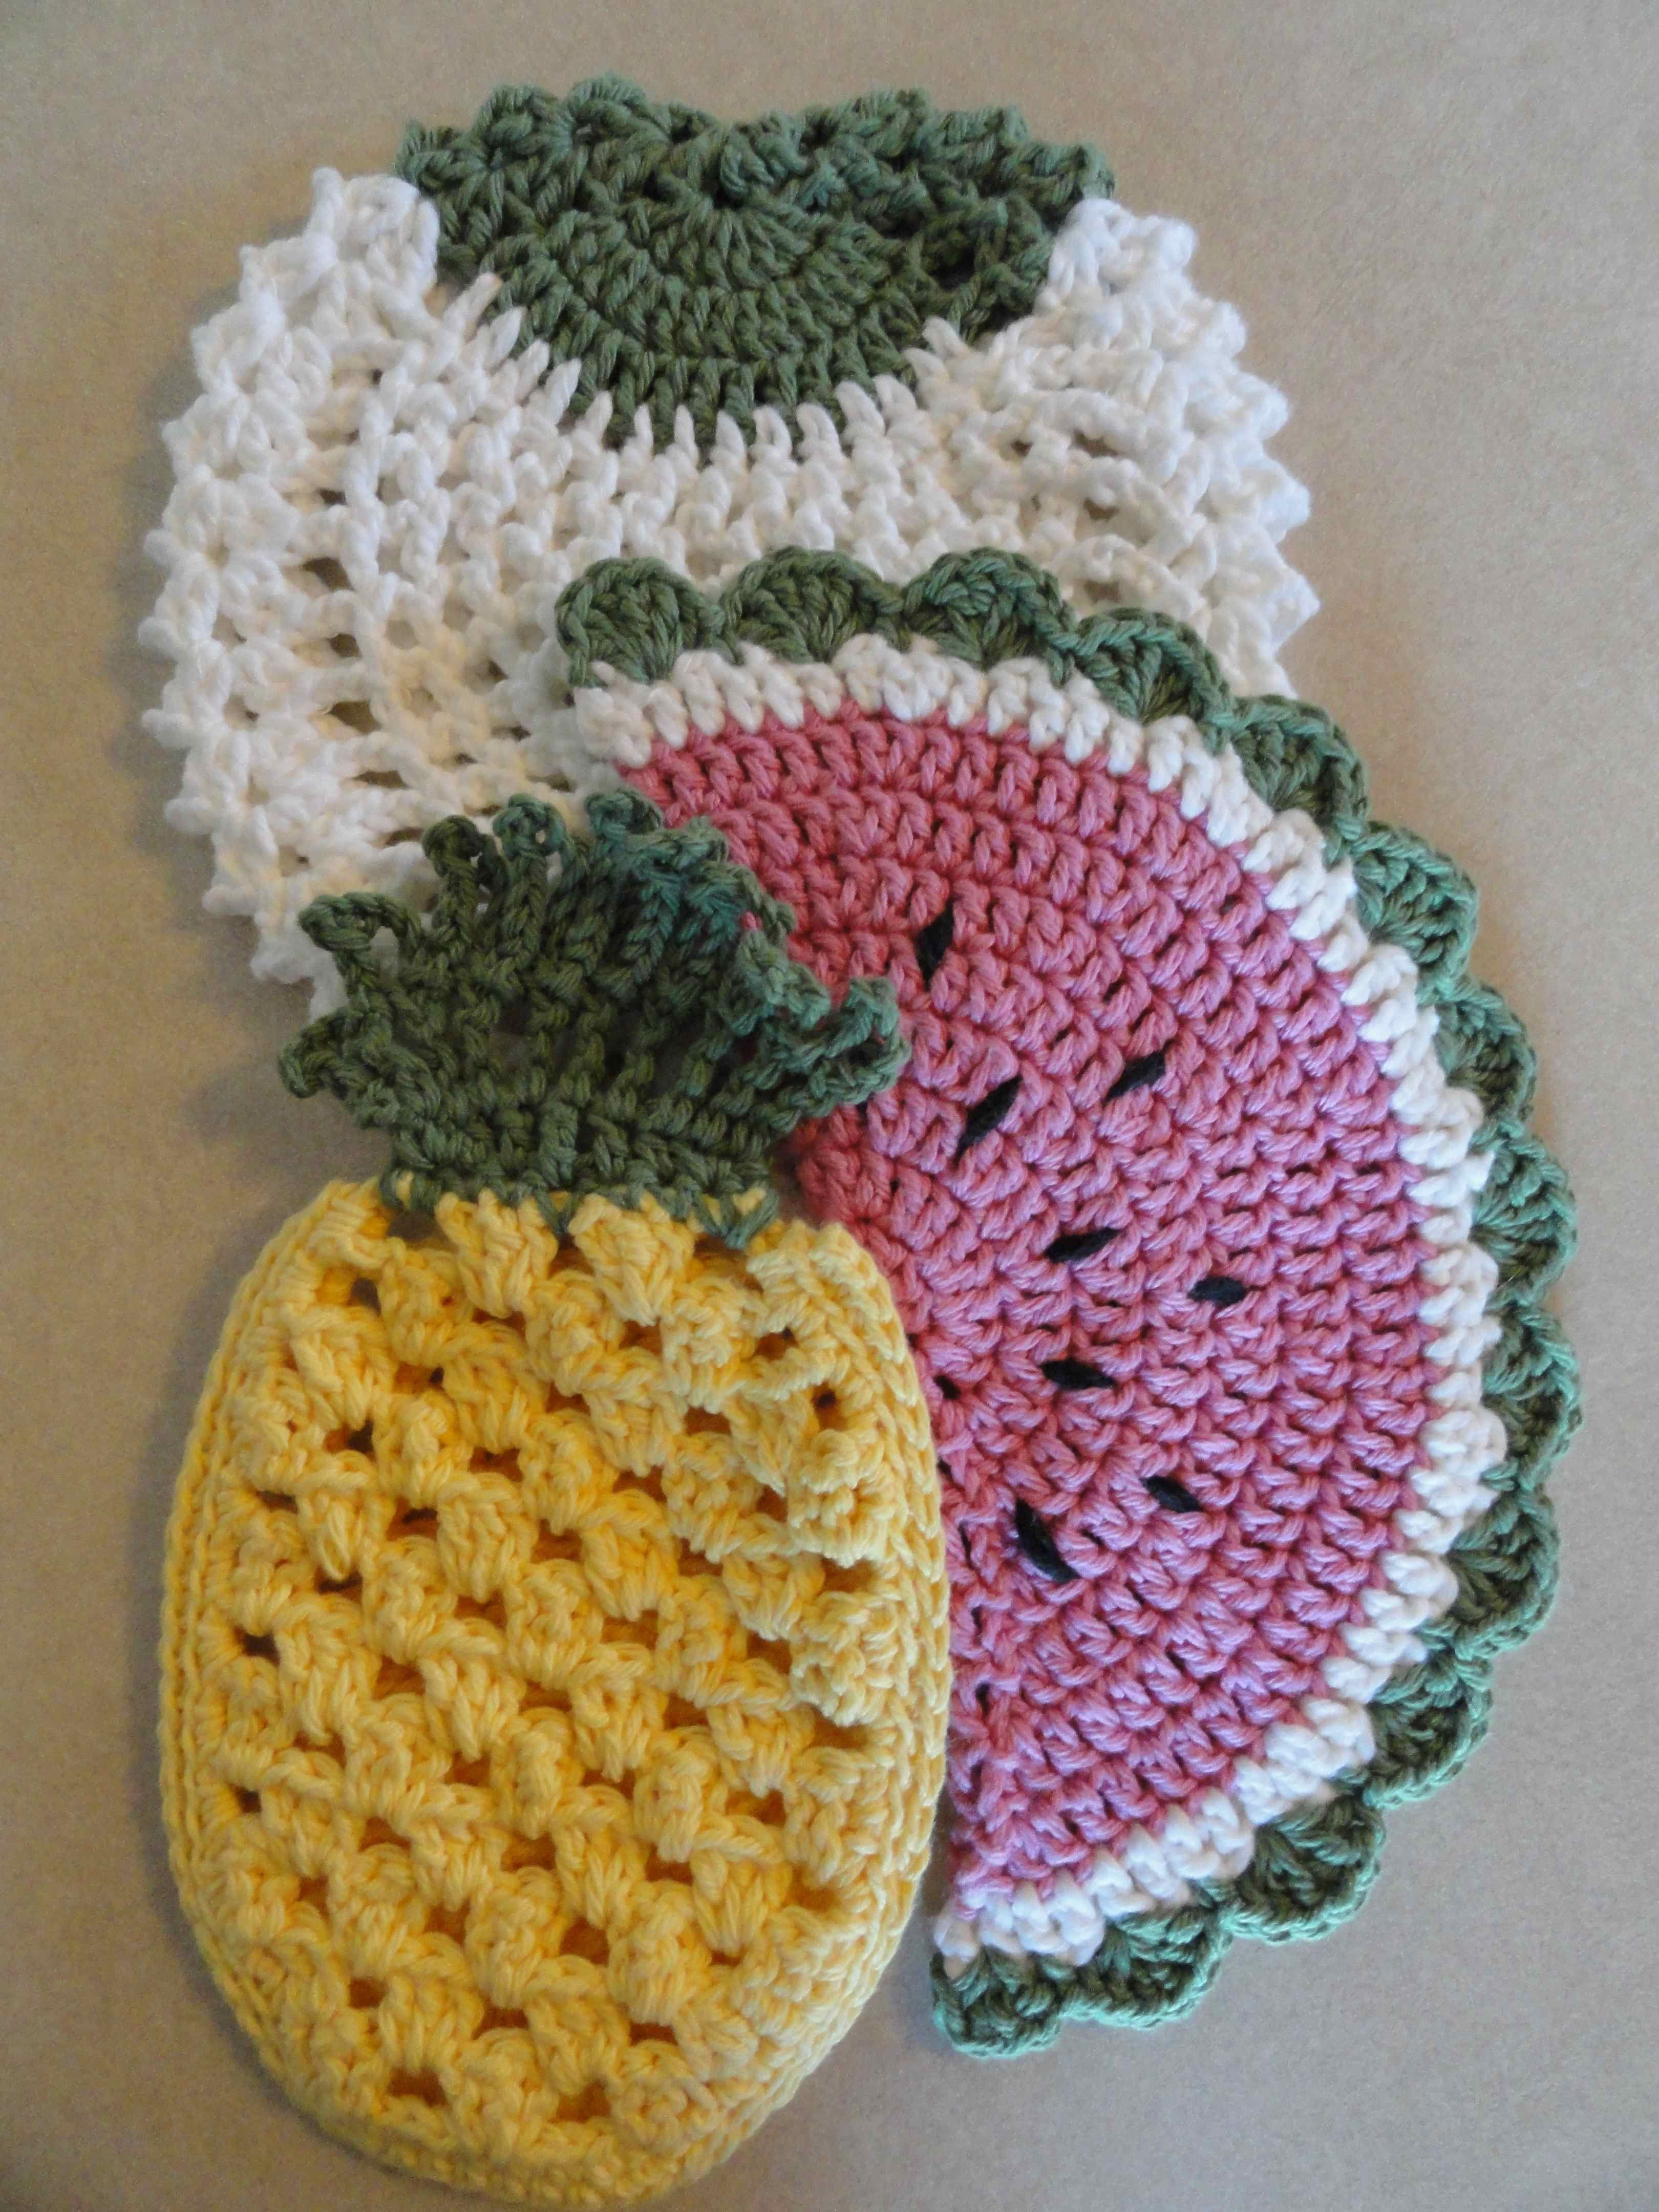 crochet:: hooker mojo found | Potholders, Crochet and Crochet coaster